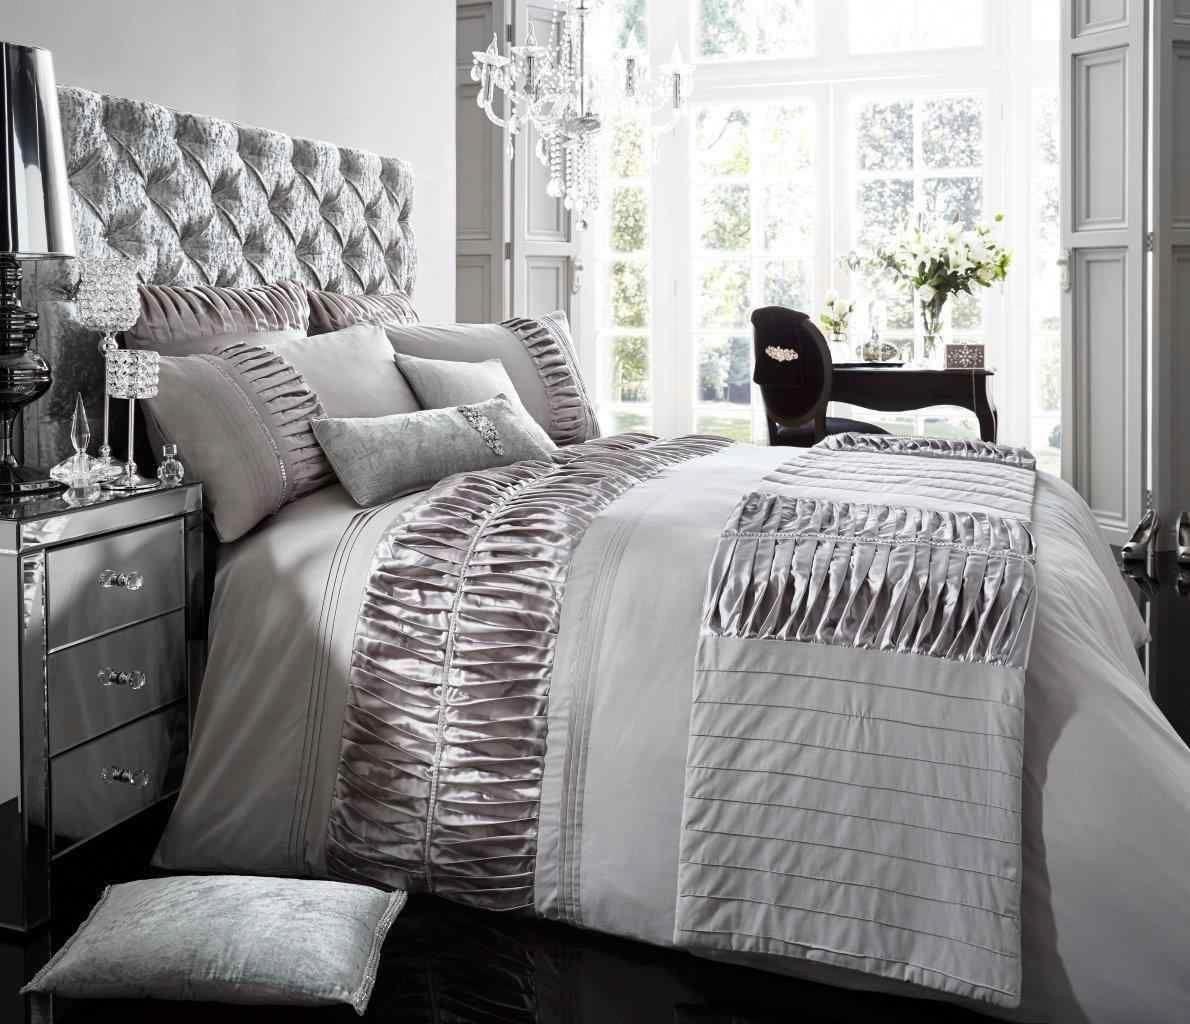 Top Bed Sheets Brands In India LuxuryBeddingSetsIndia Key